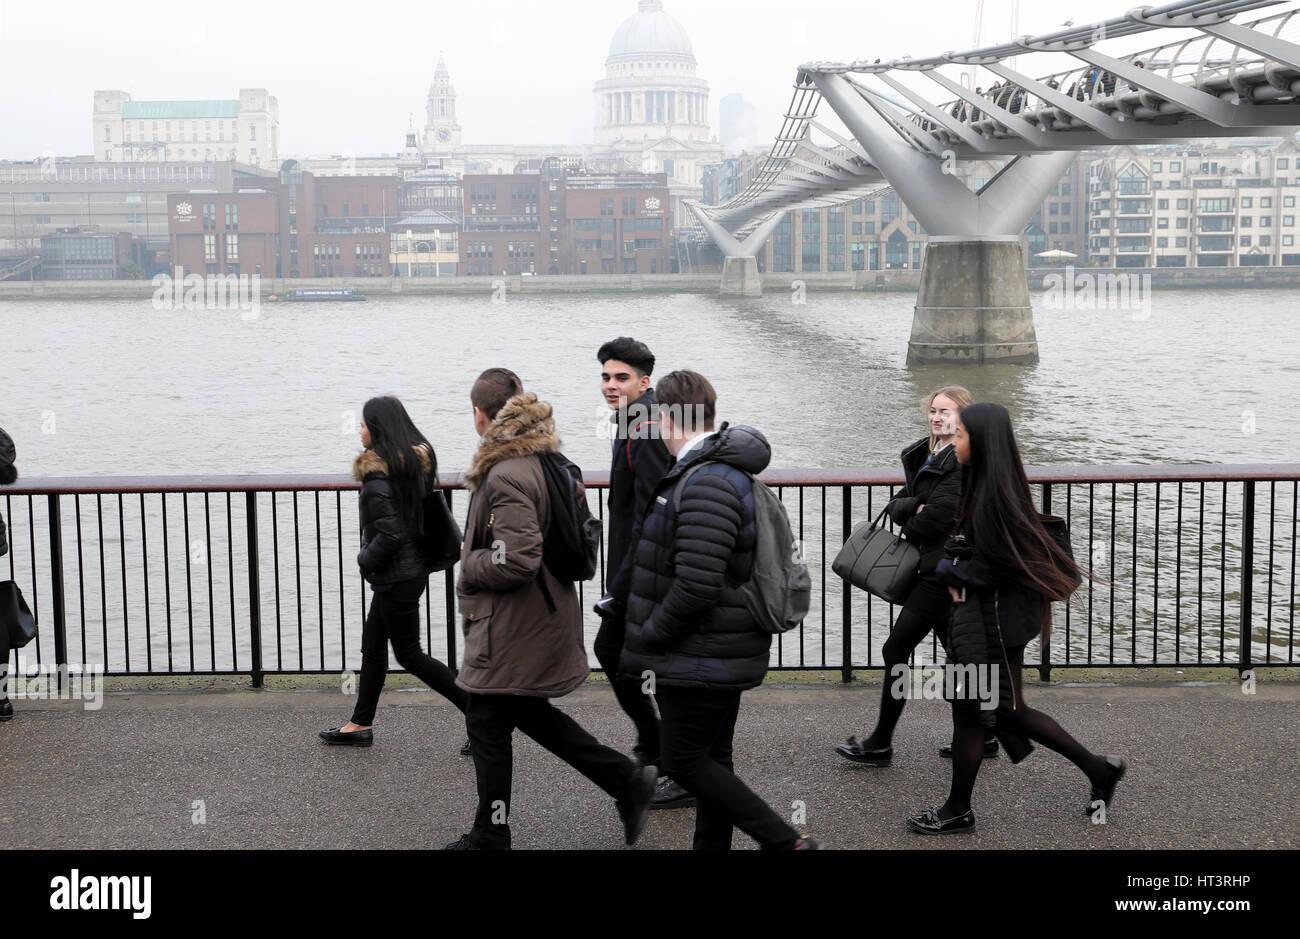 A group of students walking near the Millennium Bridge in London, UK  KATHY DEWITT - Stock Image